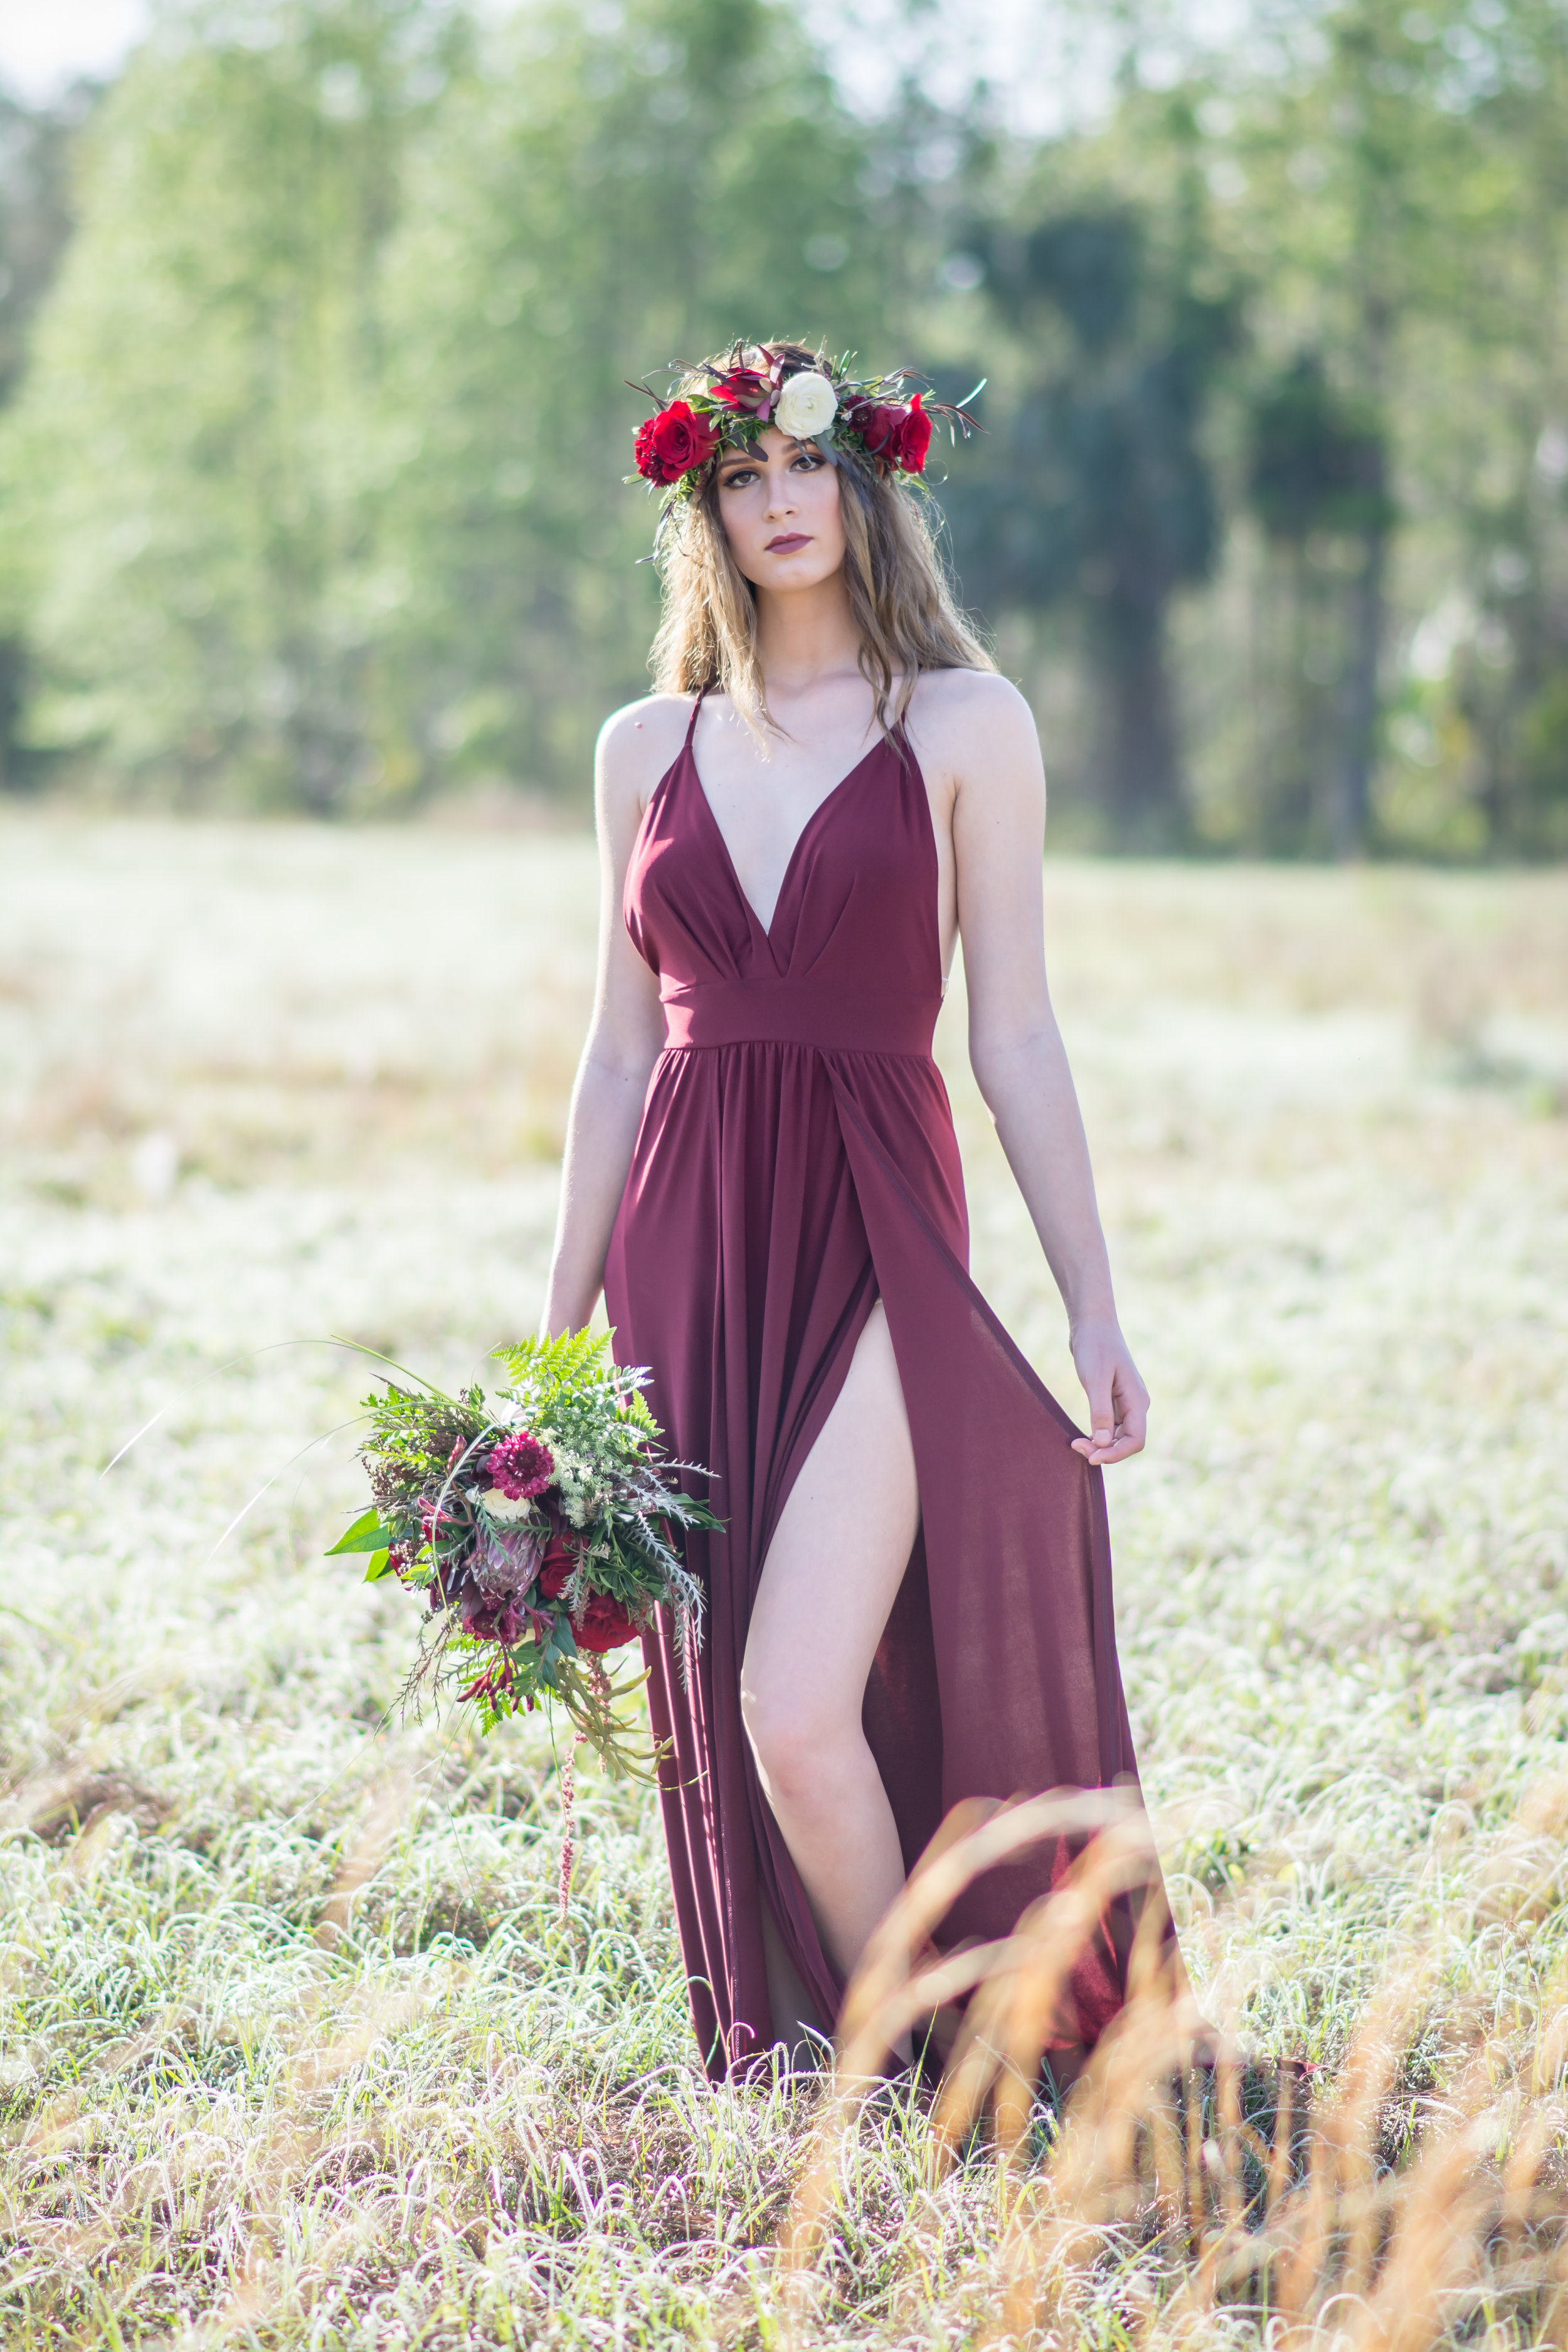 whimsical-bridal-inspiration-fashion-photoshoot-geneva-photographer-yanitza-ninett-37.jpg